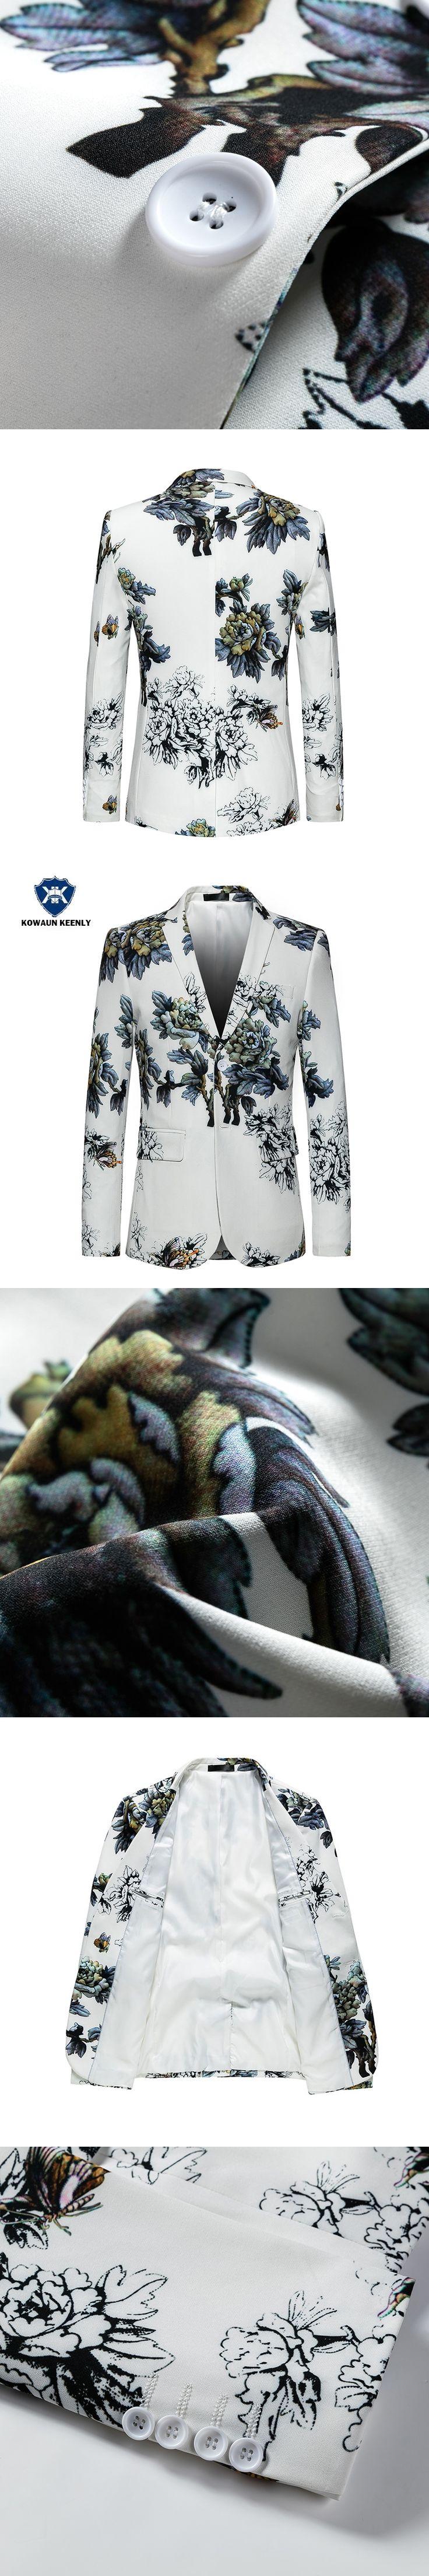 2017 Chinese Style Blazer Men Slim Floral Blazer Luxury Print Casual White Suit Jacket Coats Stage Wear Prom Blazers  5XL 6XL